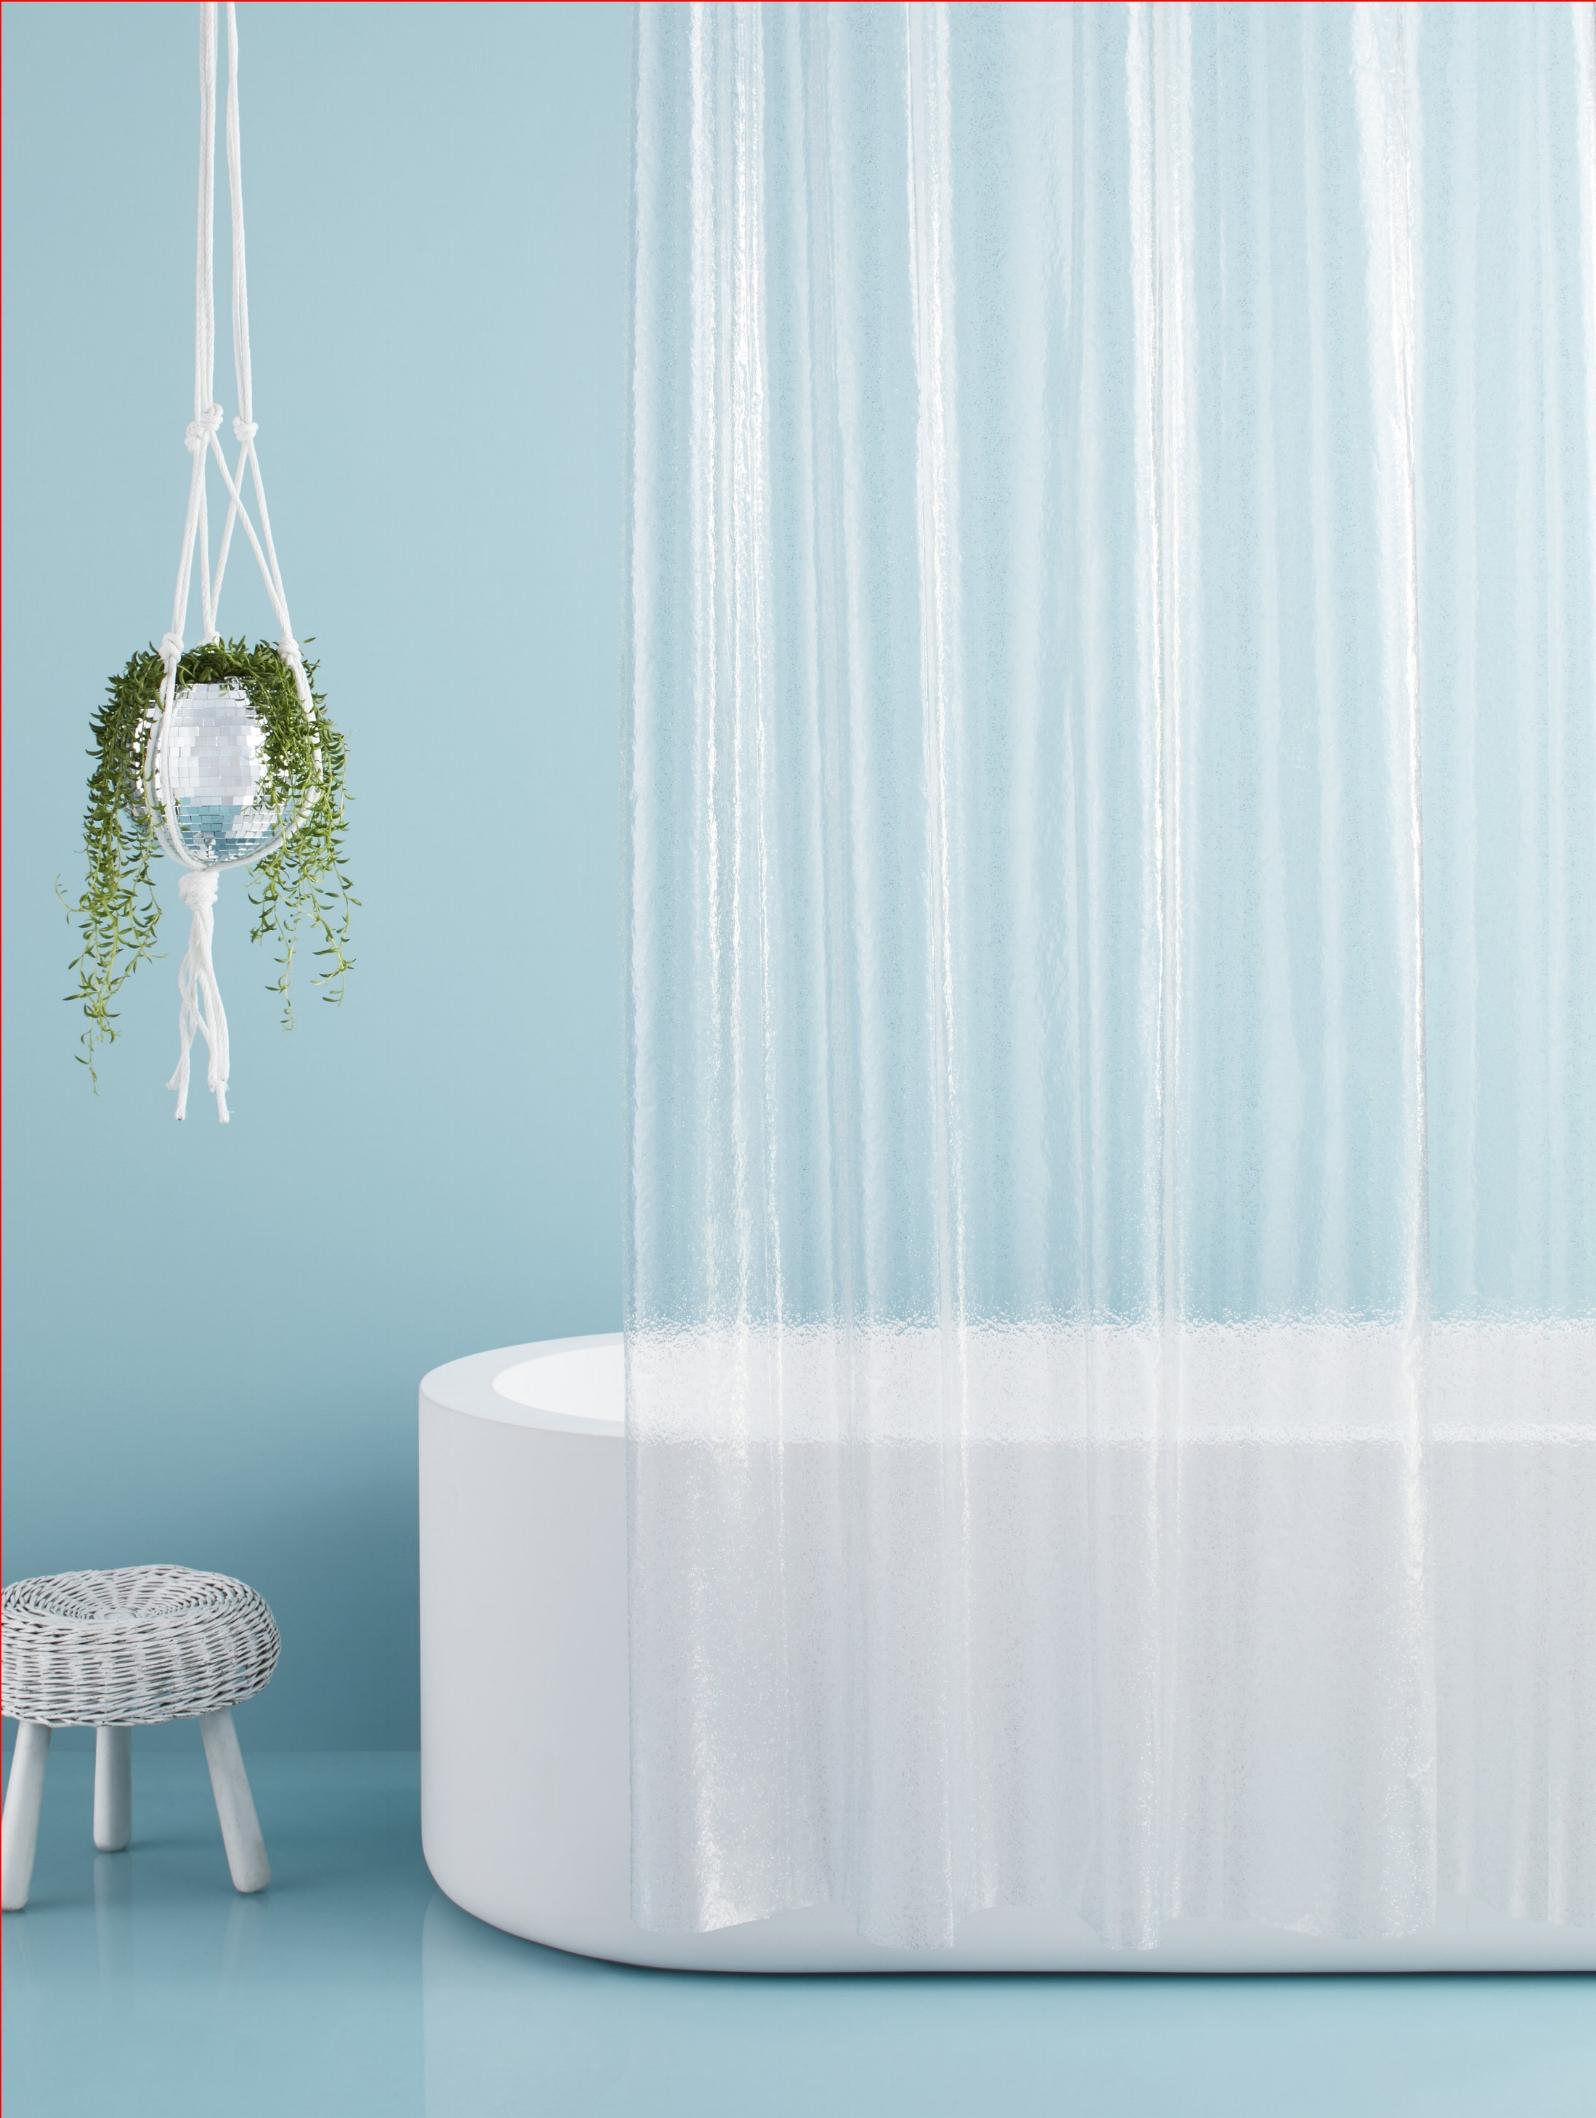 C-000693-01-091_064-18-3895_Shower Curtain Glitter PEVA Room Essentials.jpg